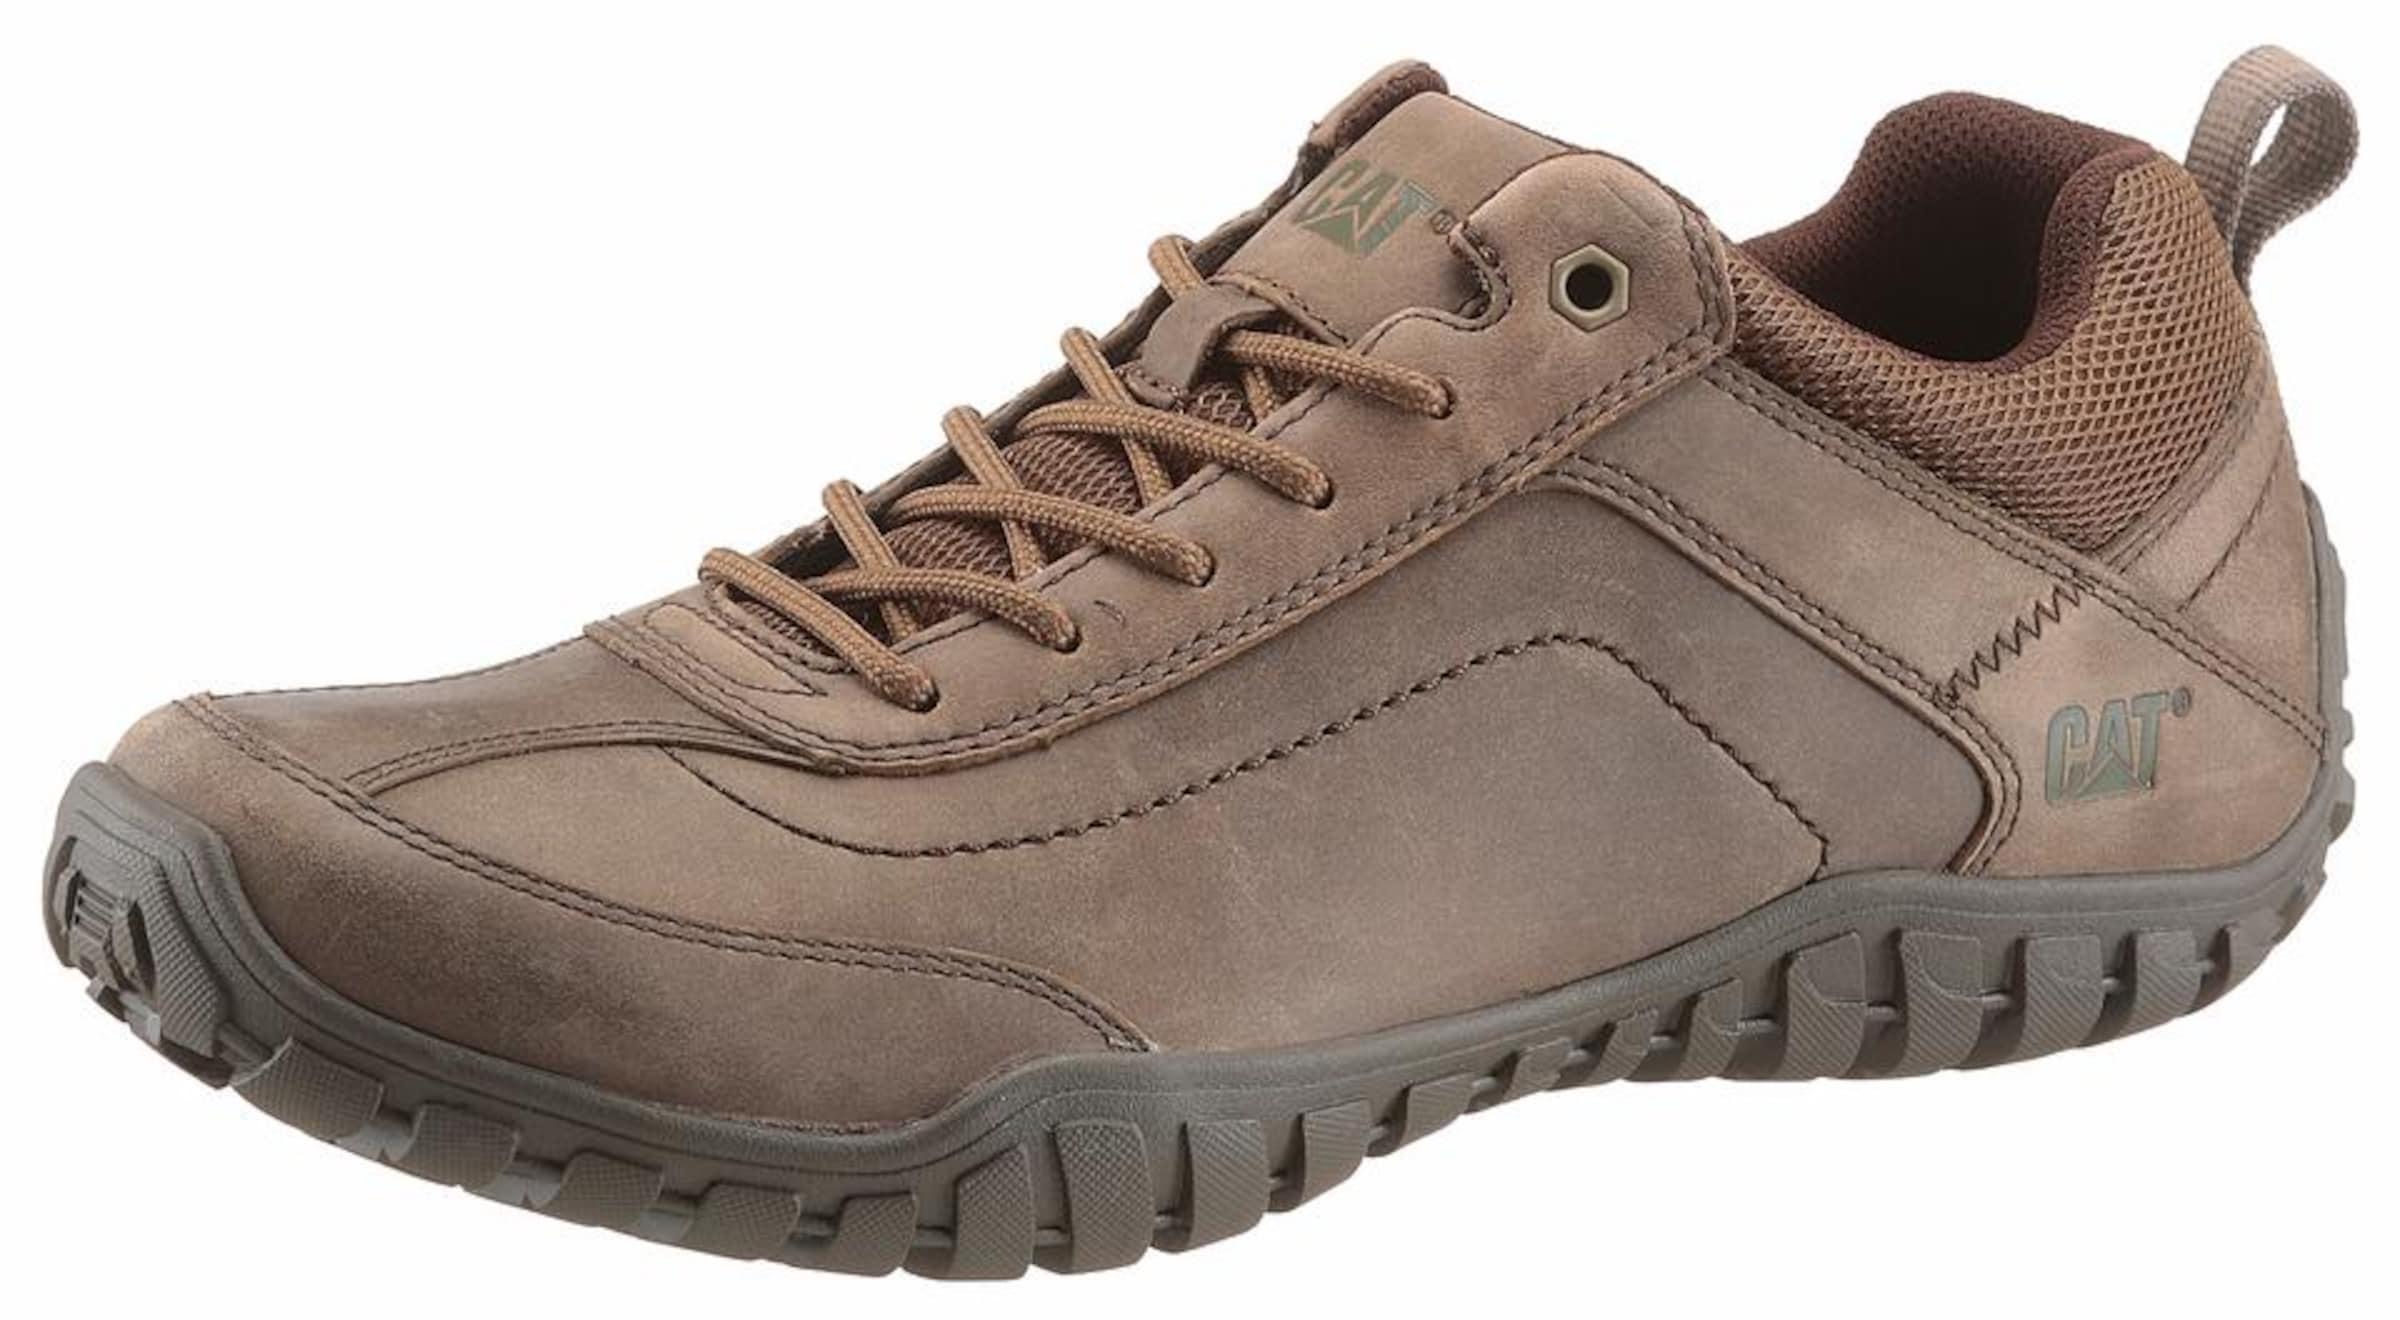 CATERPILLAR Halbschuhe Halbschuhe Halbschuhe Verschleißfeste billige Schuhe Hohe Qualität f48f72